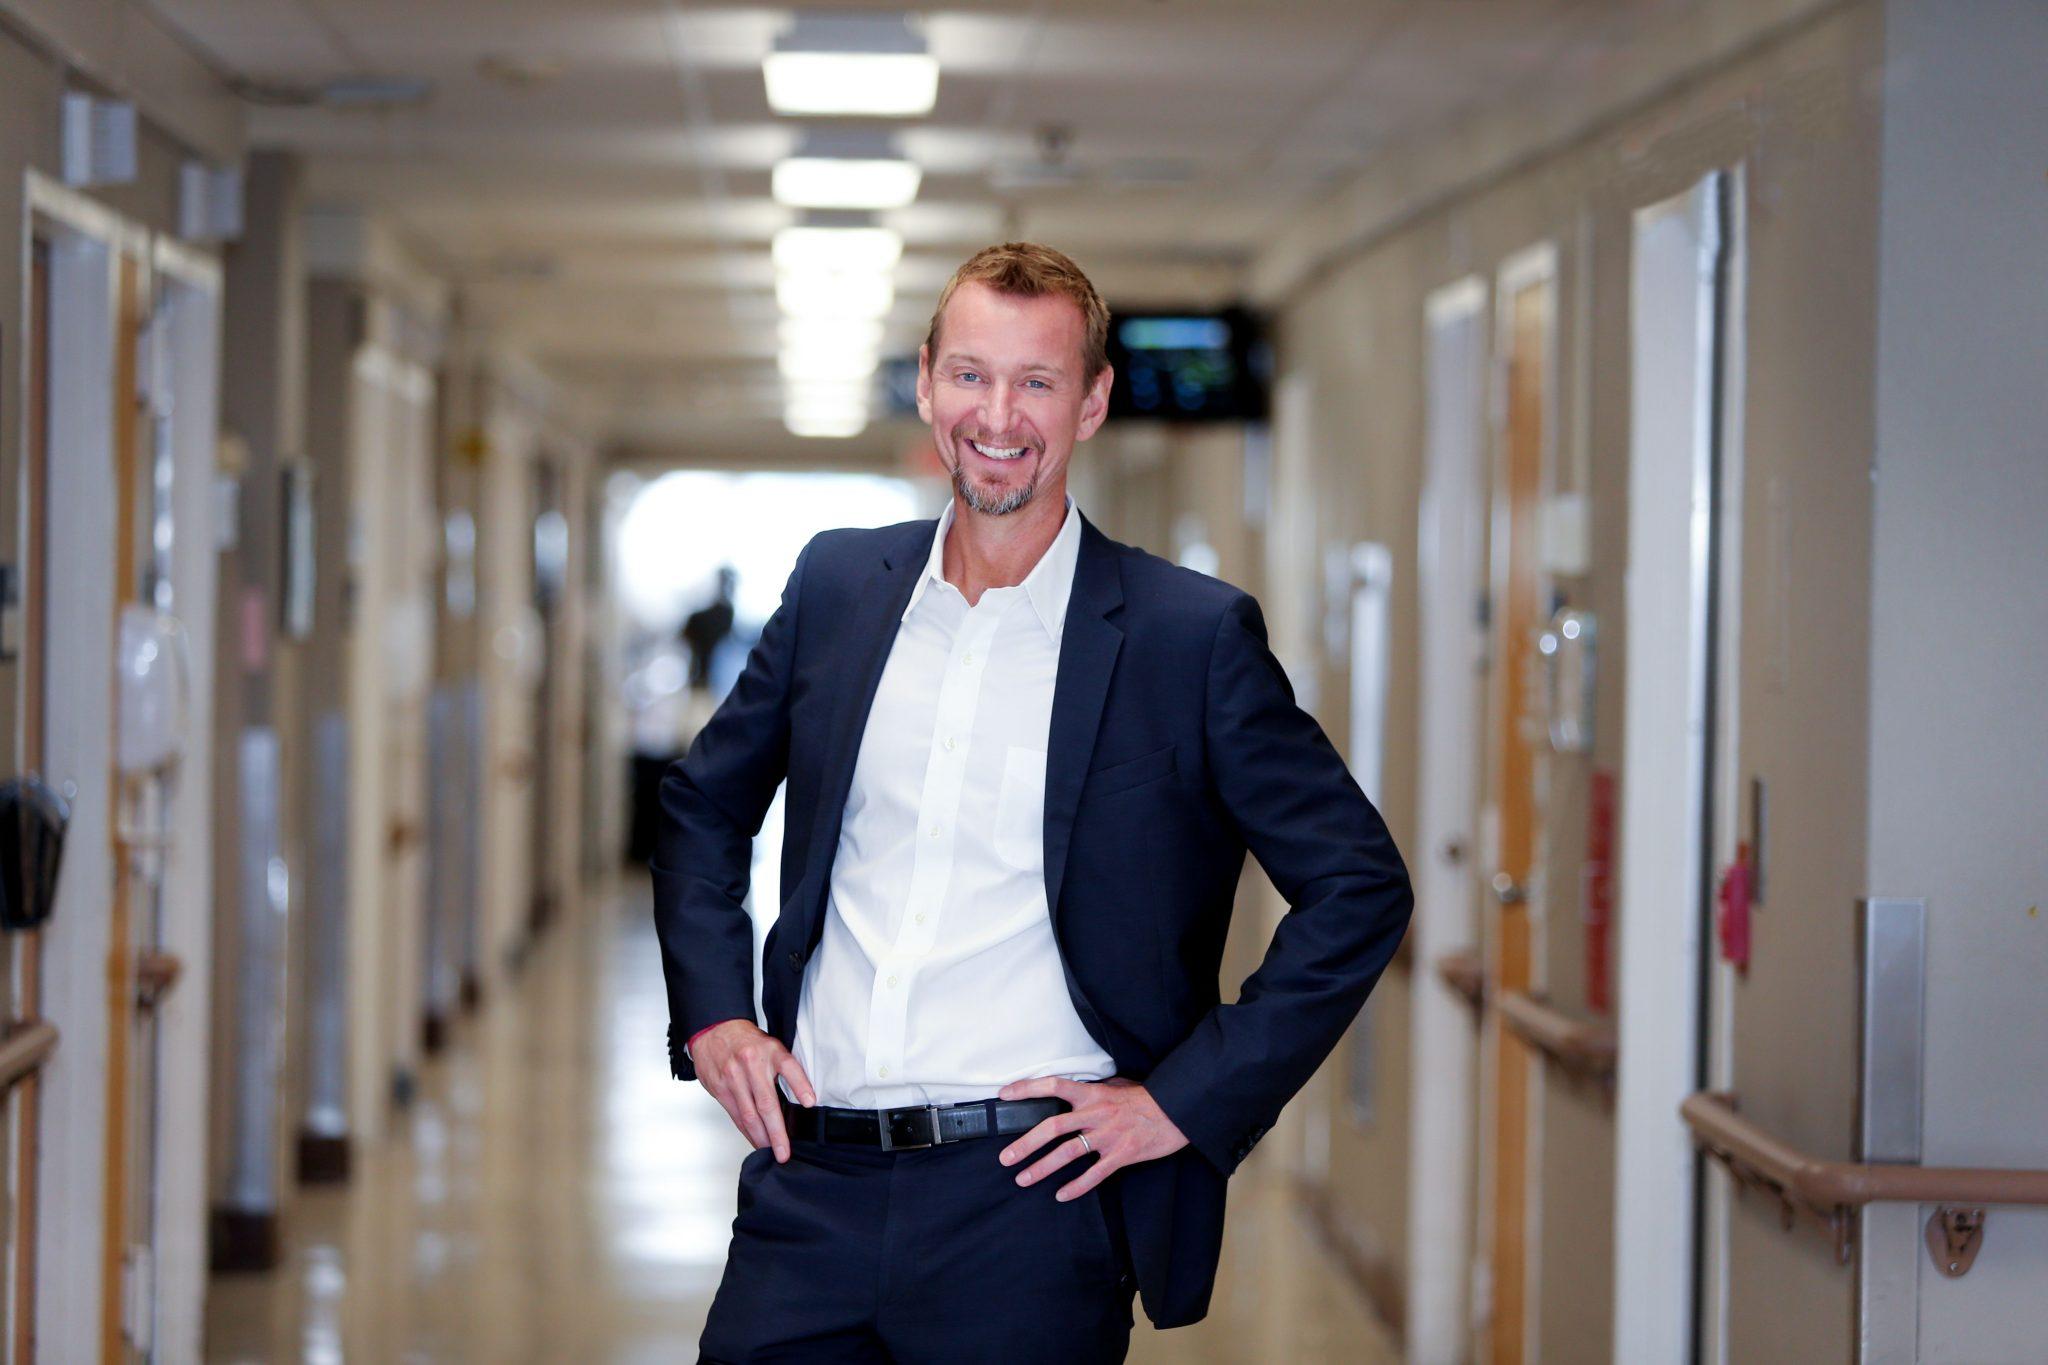 Dr Justin Lundbye - CEO of TesselMed